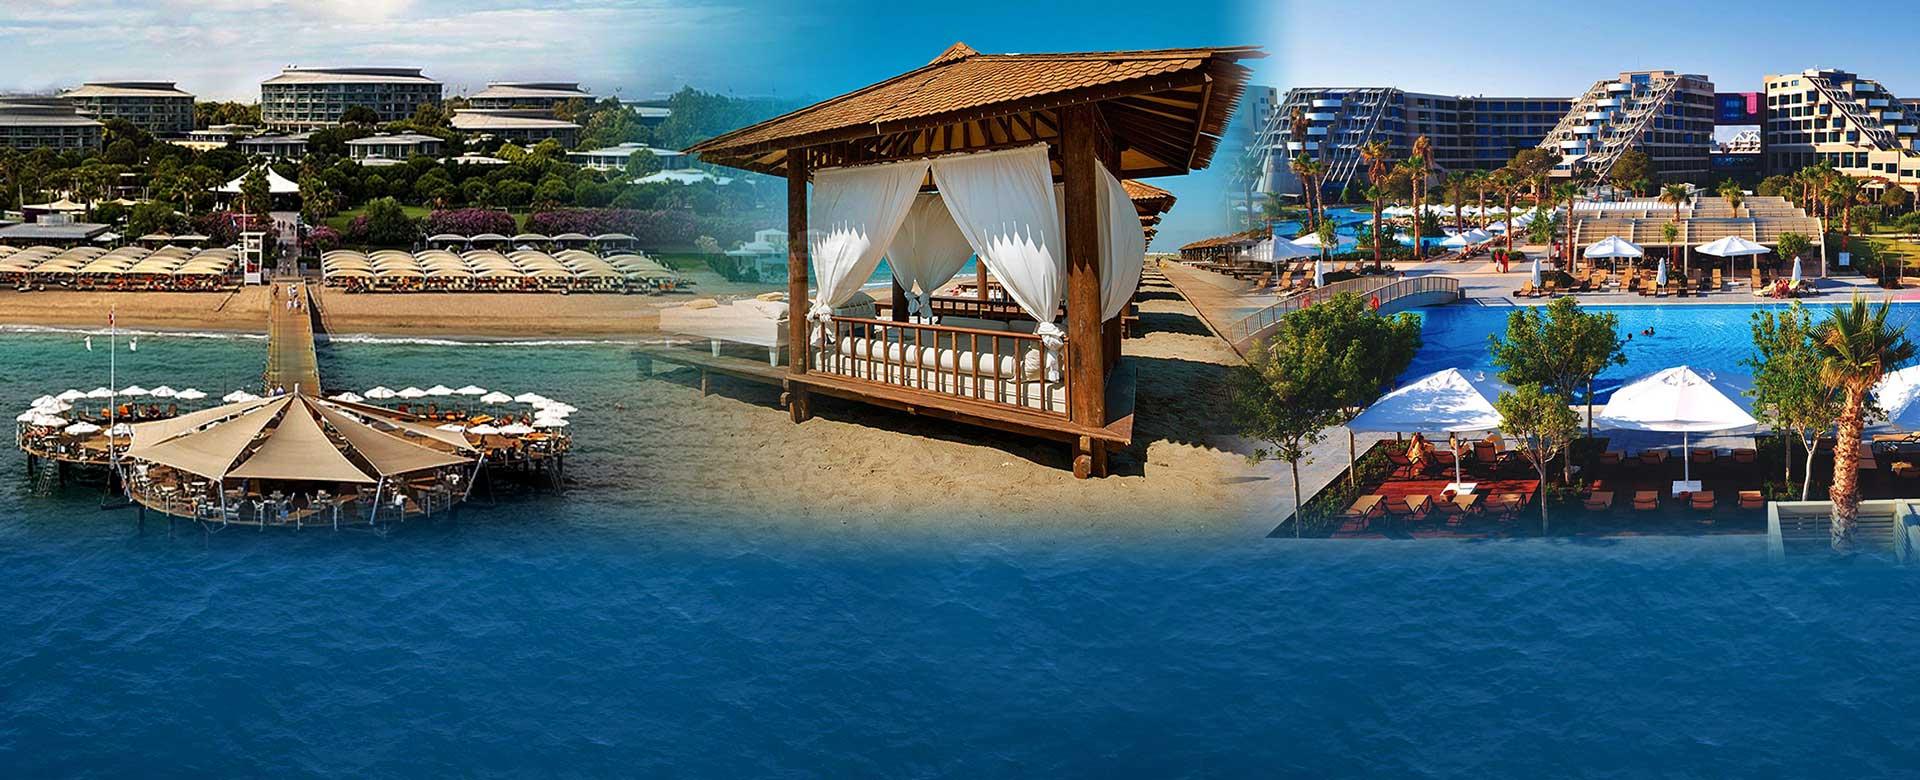 Belek hoteli za leto 2021. u Turskoj, first i last minute popustima i specijalnim ponudama, avio prevoz direktnim čarter letom. Prelepi hoteli na Kleopatrinoj plaži.